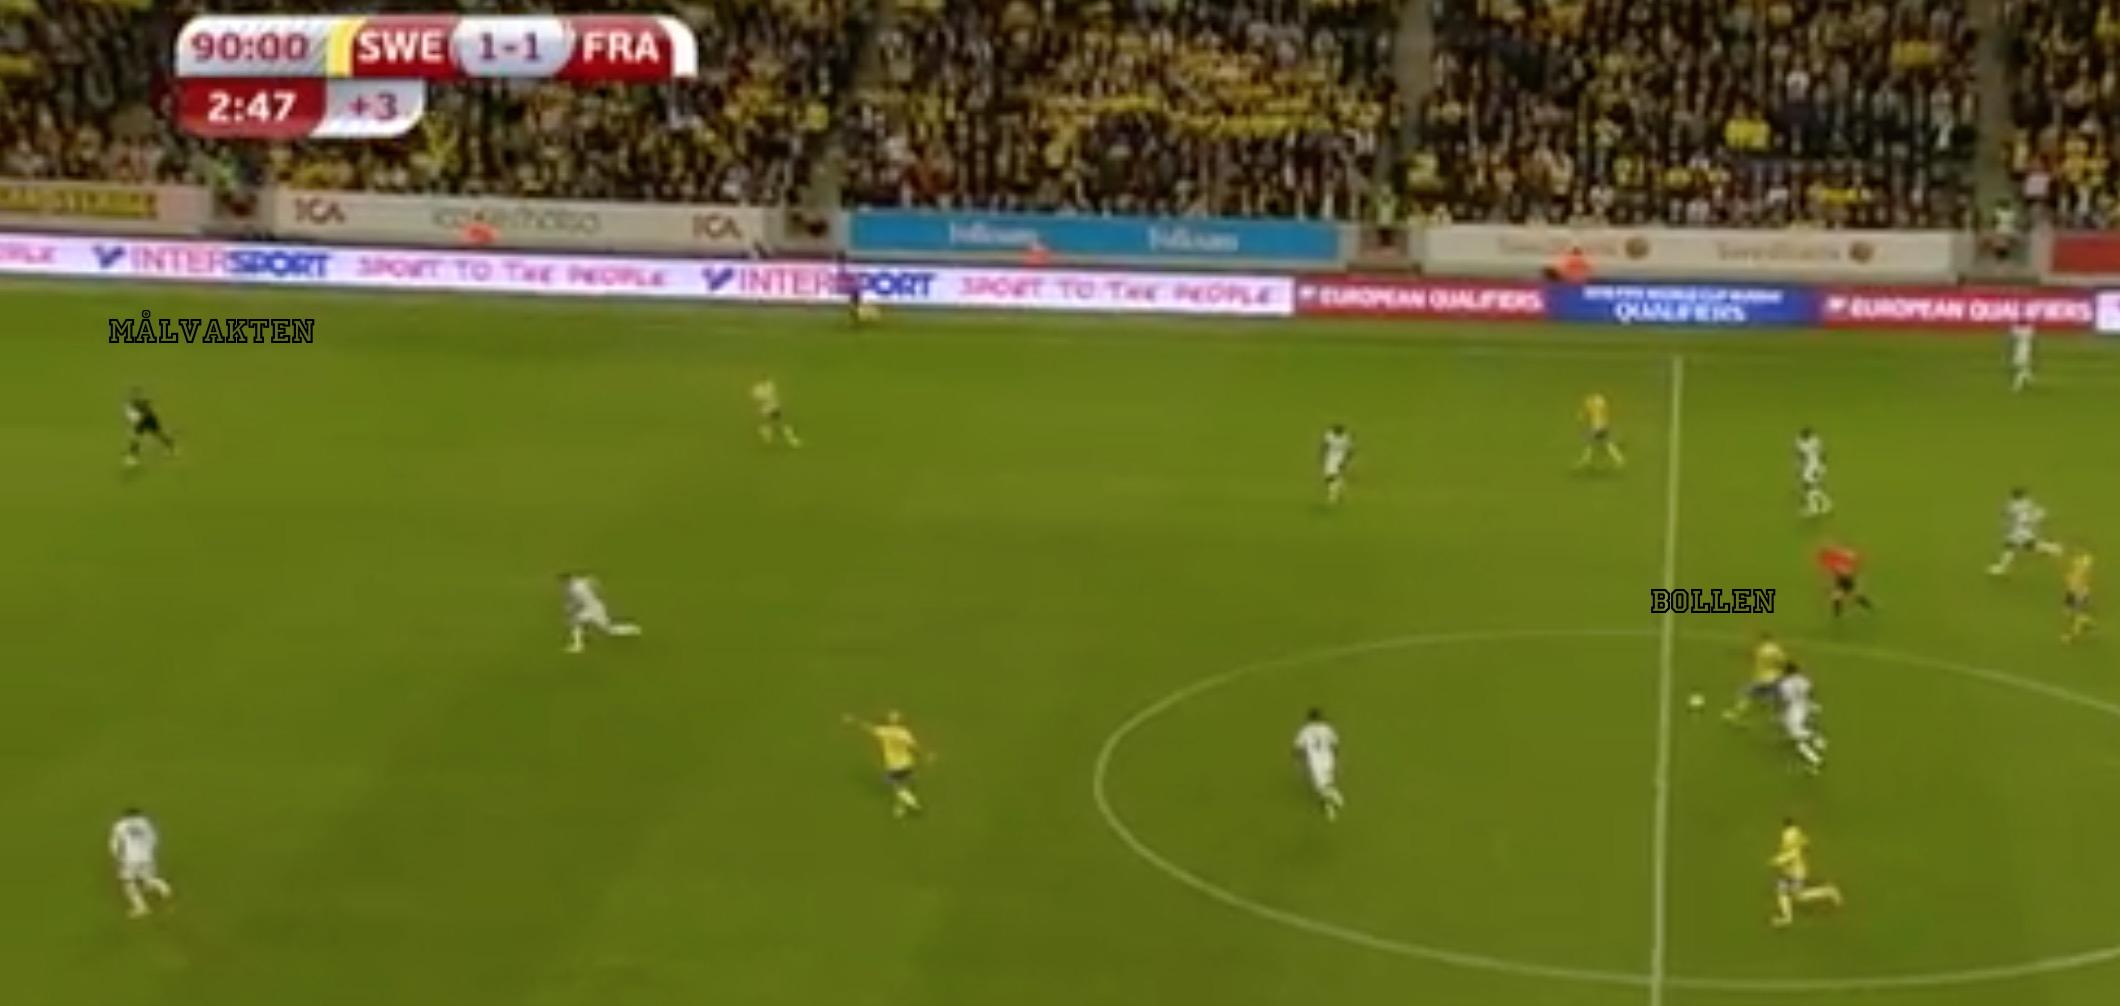 frankrike fotboll